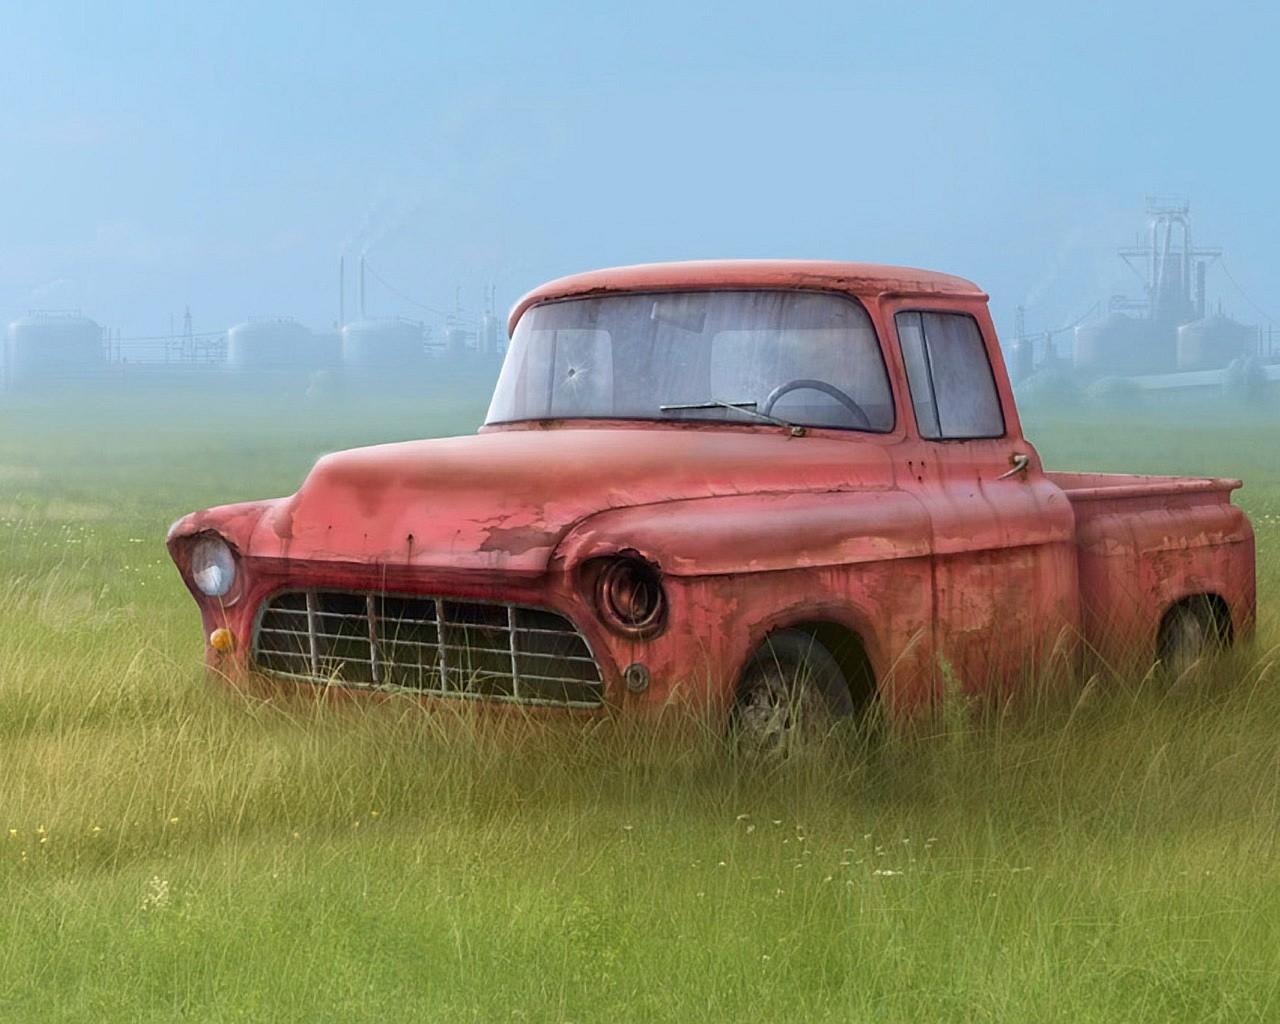 Classic Truck Wallpaper Downloads 9244   Amazing Wallpaperz 1280x1024